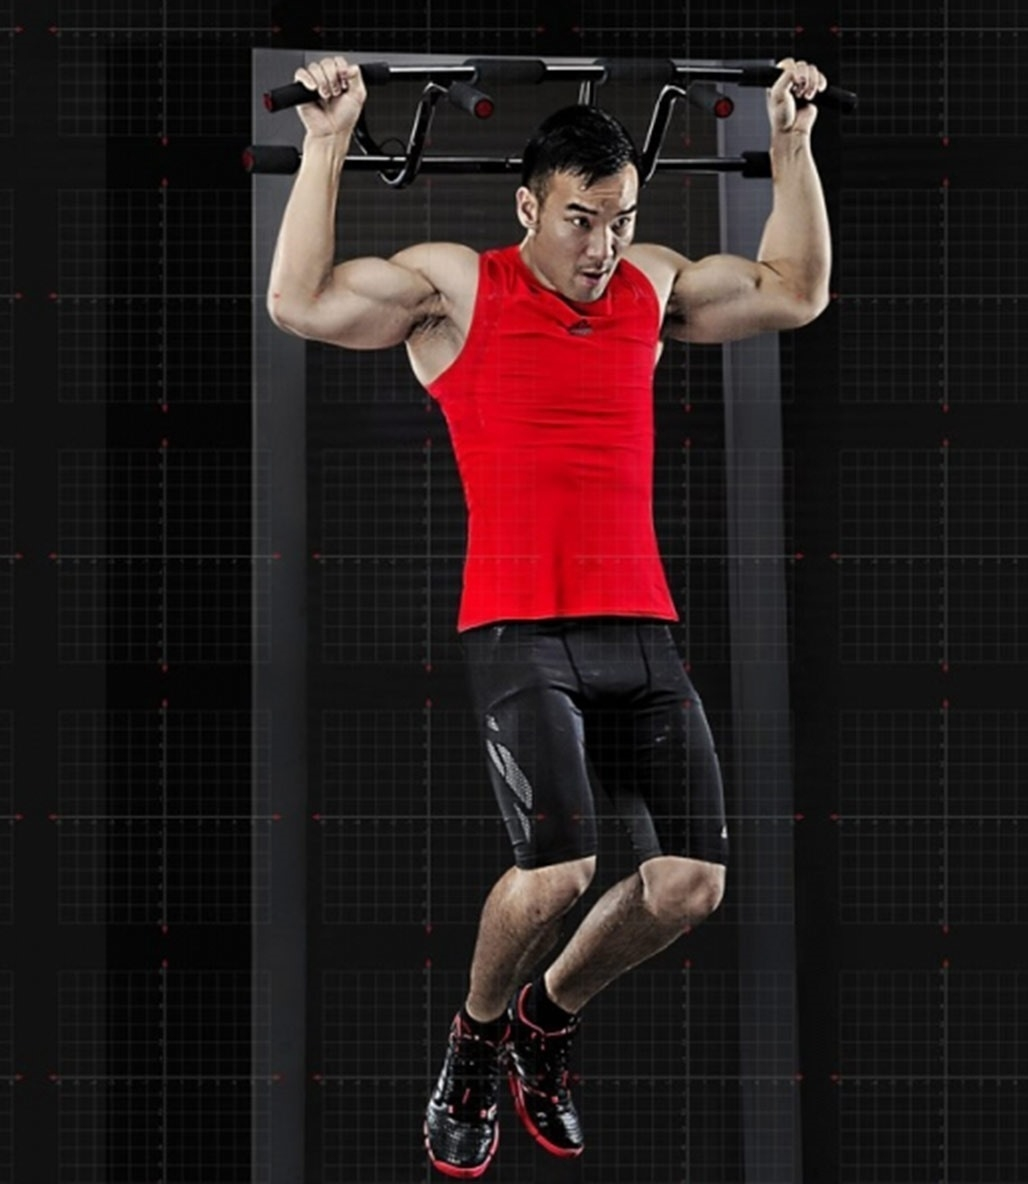 Adidas Elite Grip Trainer Door Gym Kapı Barfiksi